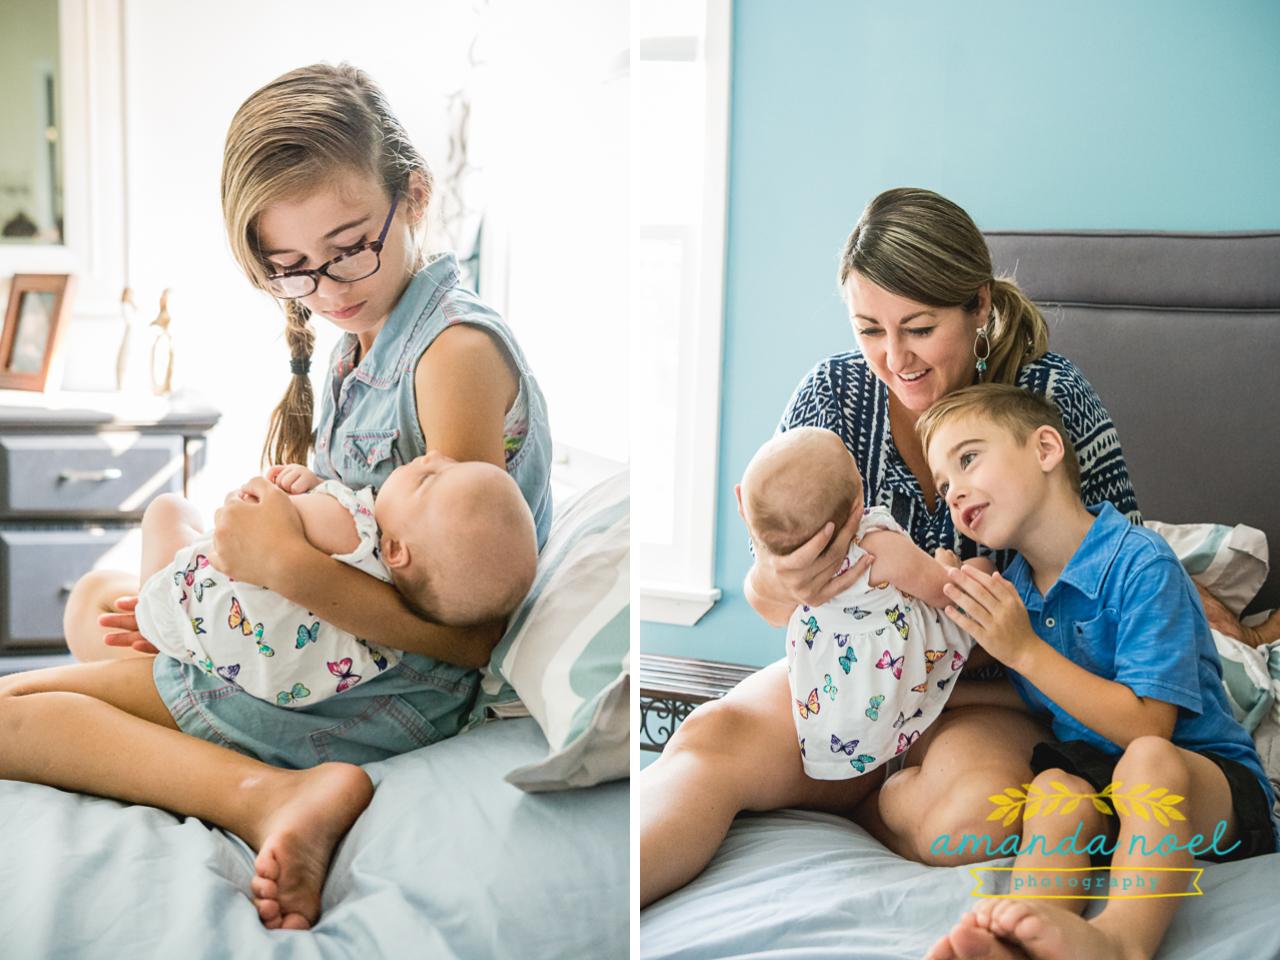 springfielld-ohio-newborn-lifestyle-photographer-baby-girl-home-siblings.jpg